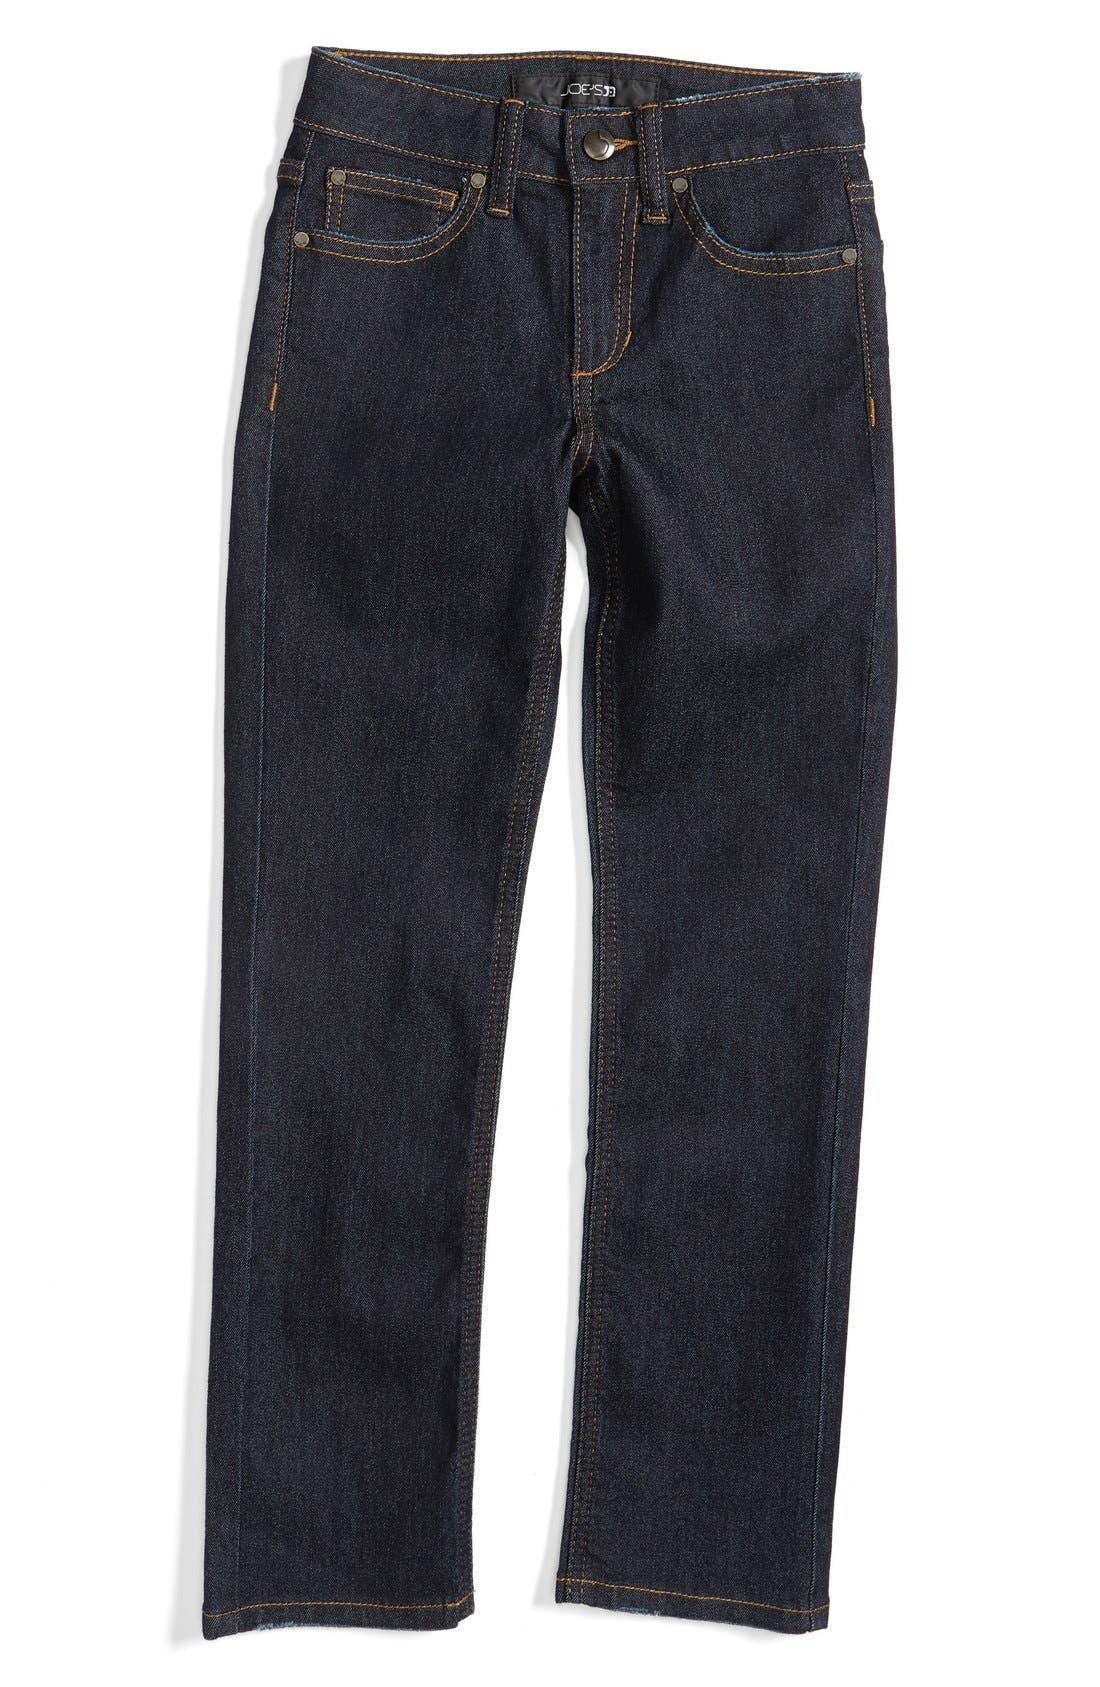 Brixton Straight Leg Jeans,                         Main,                         color, 400